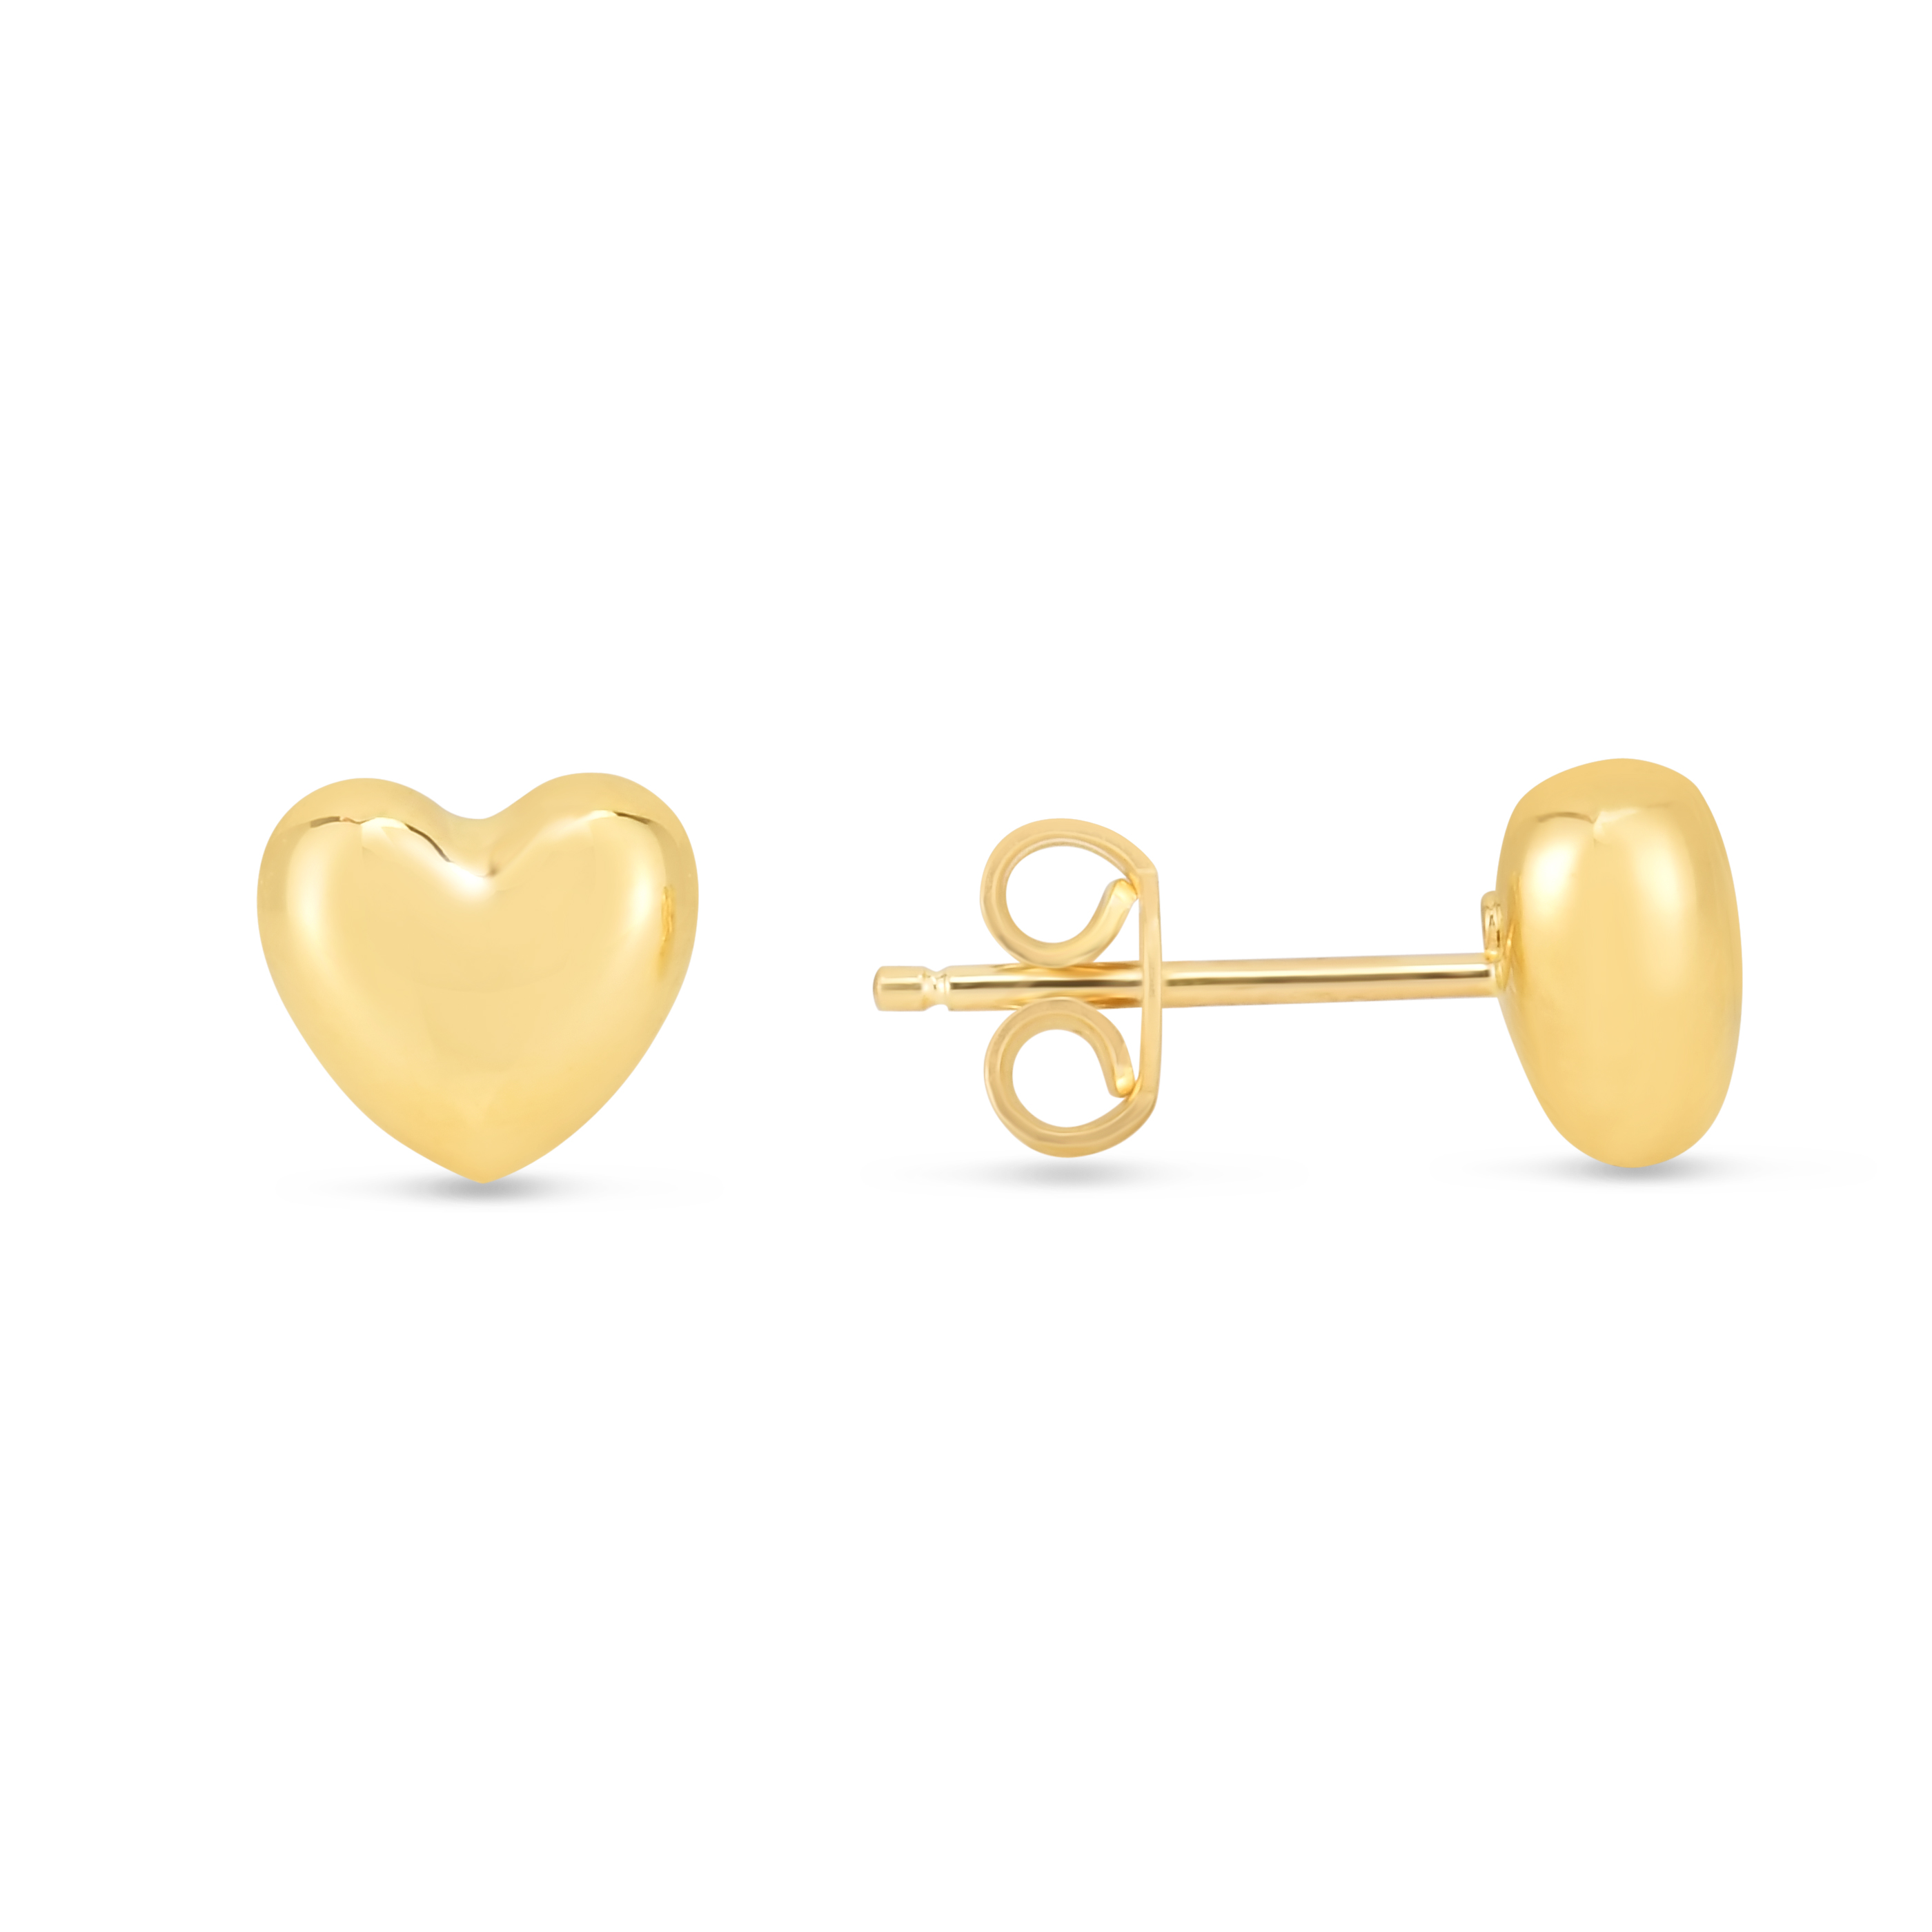 14k-gold-small-polished-heart-post-earring-er4084_ring